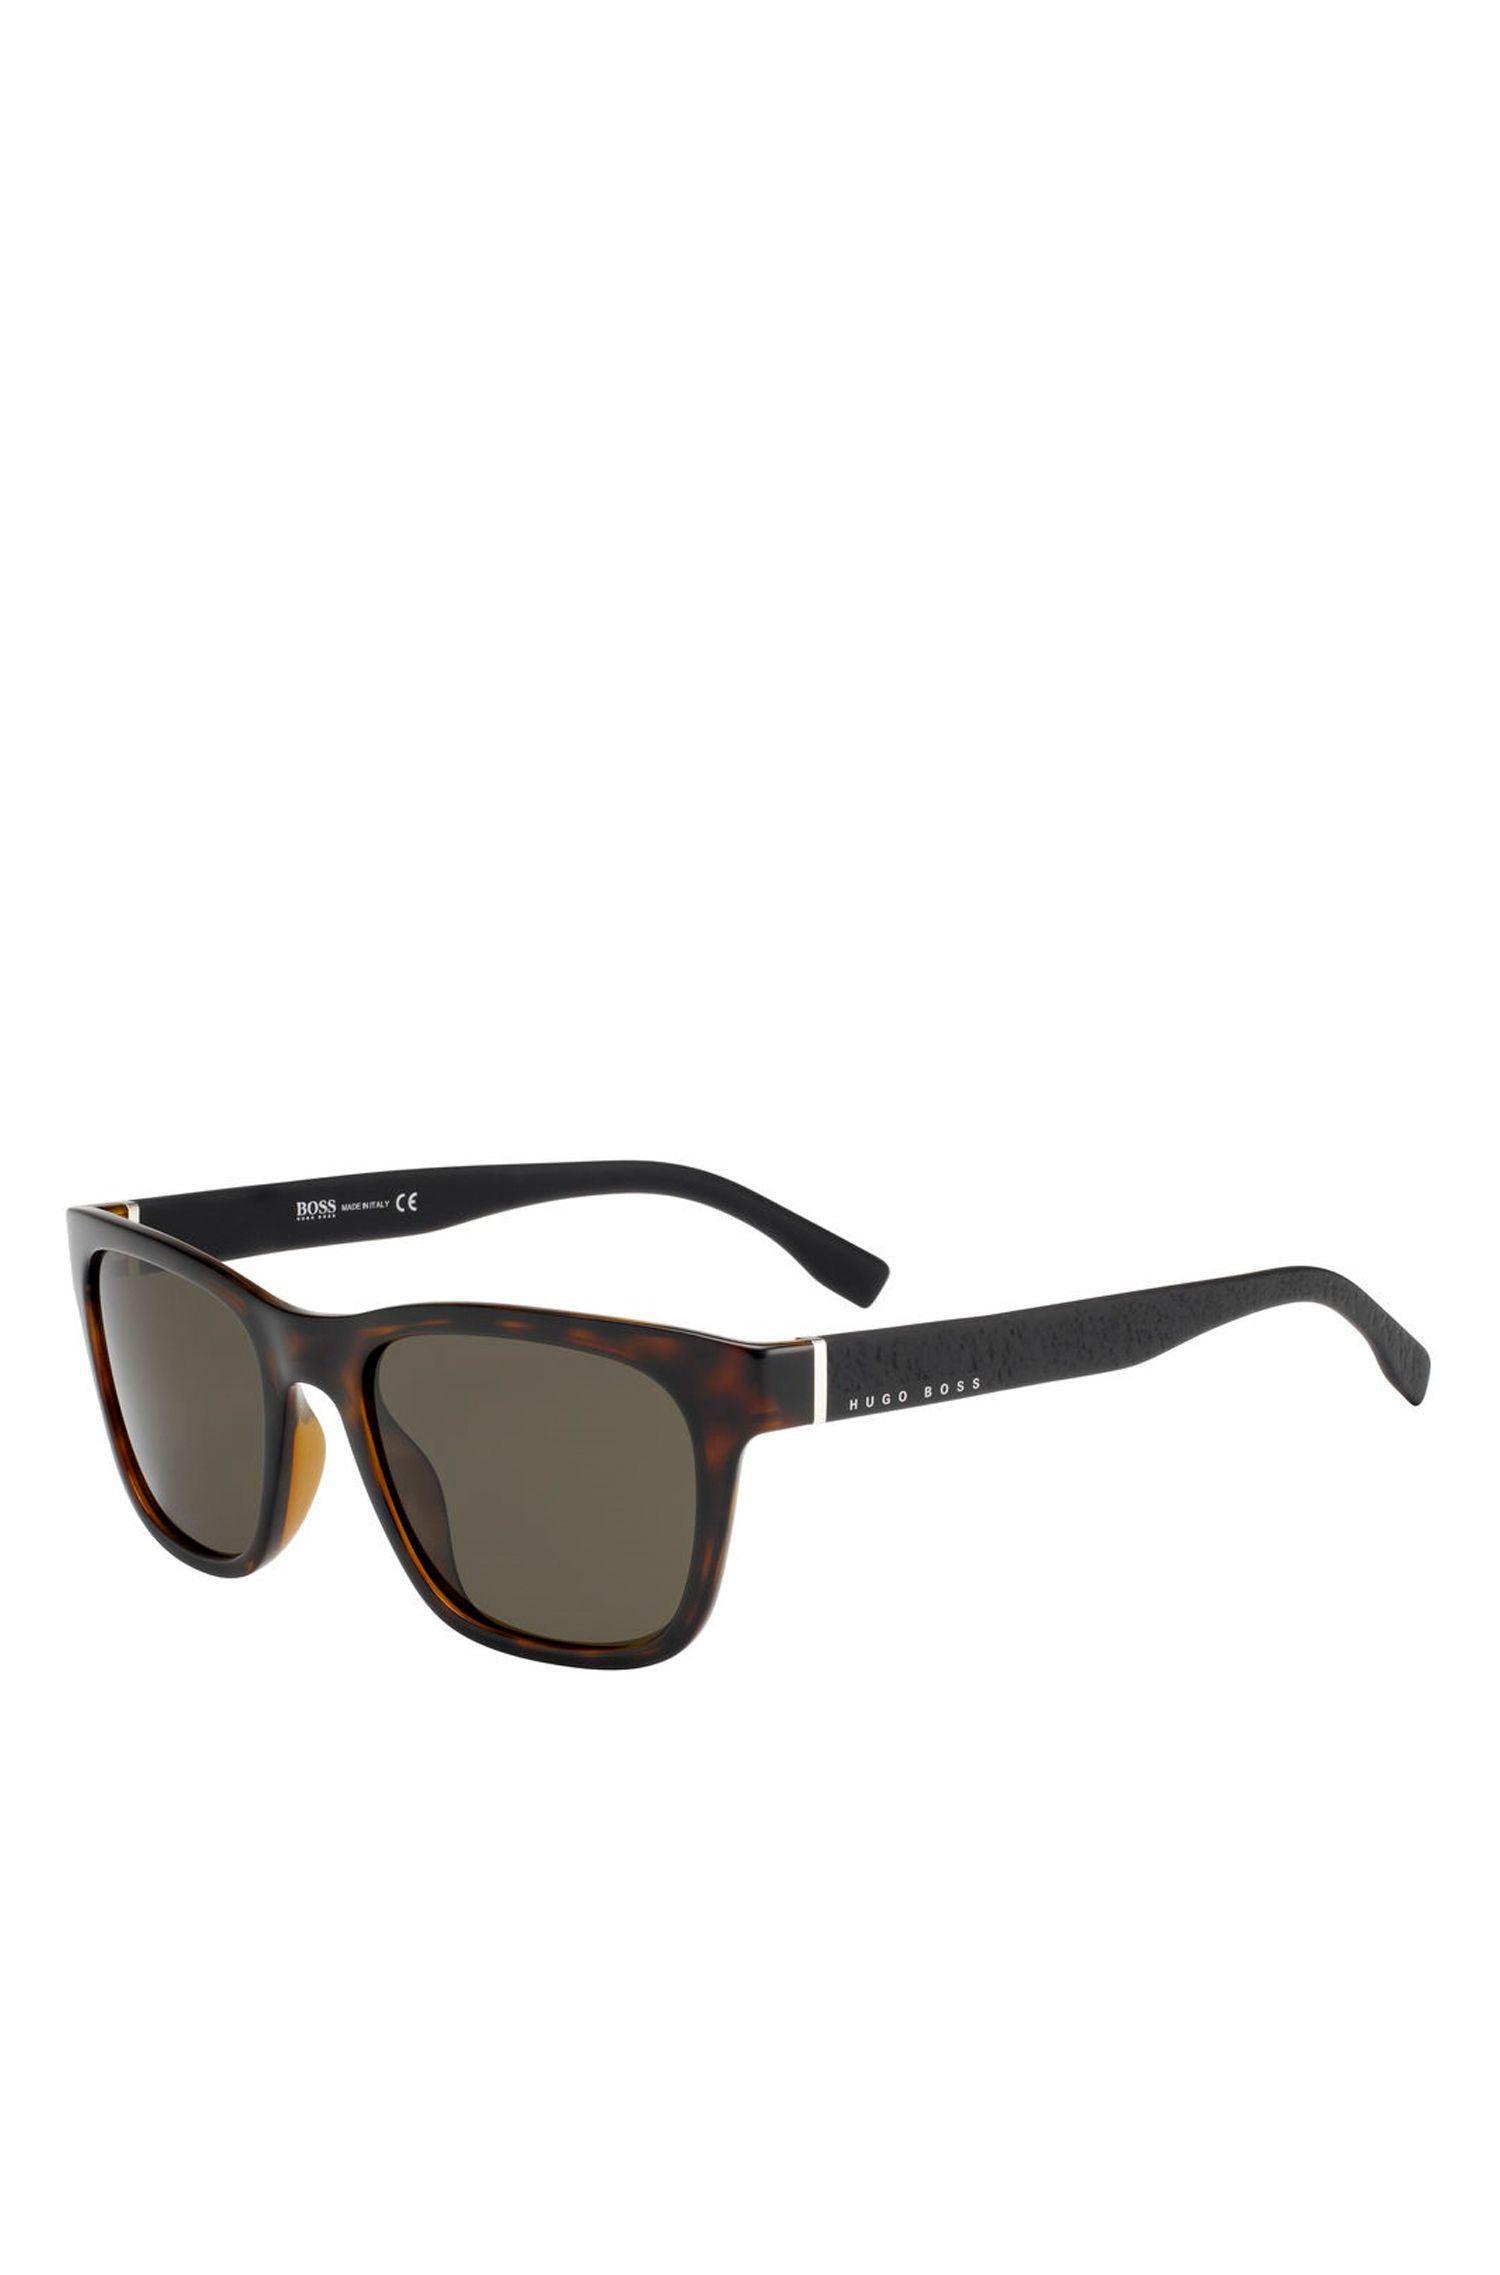 Black Lens Havana Square Sunglasses | BOSS 0830, Assorted-Pre-Pack